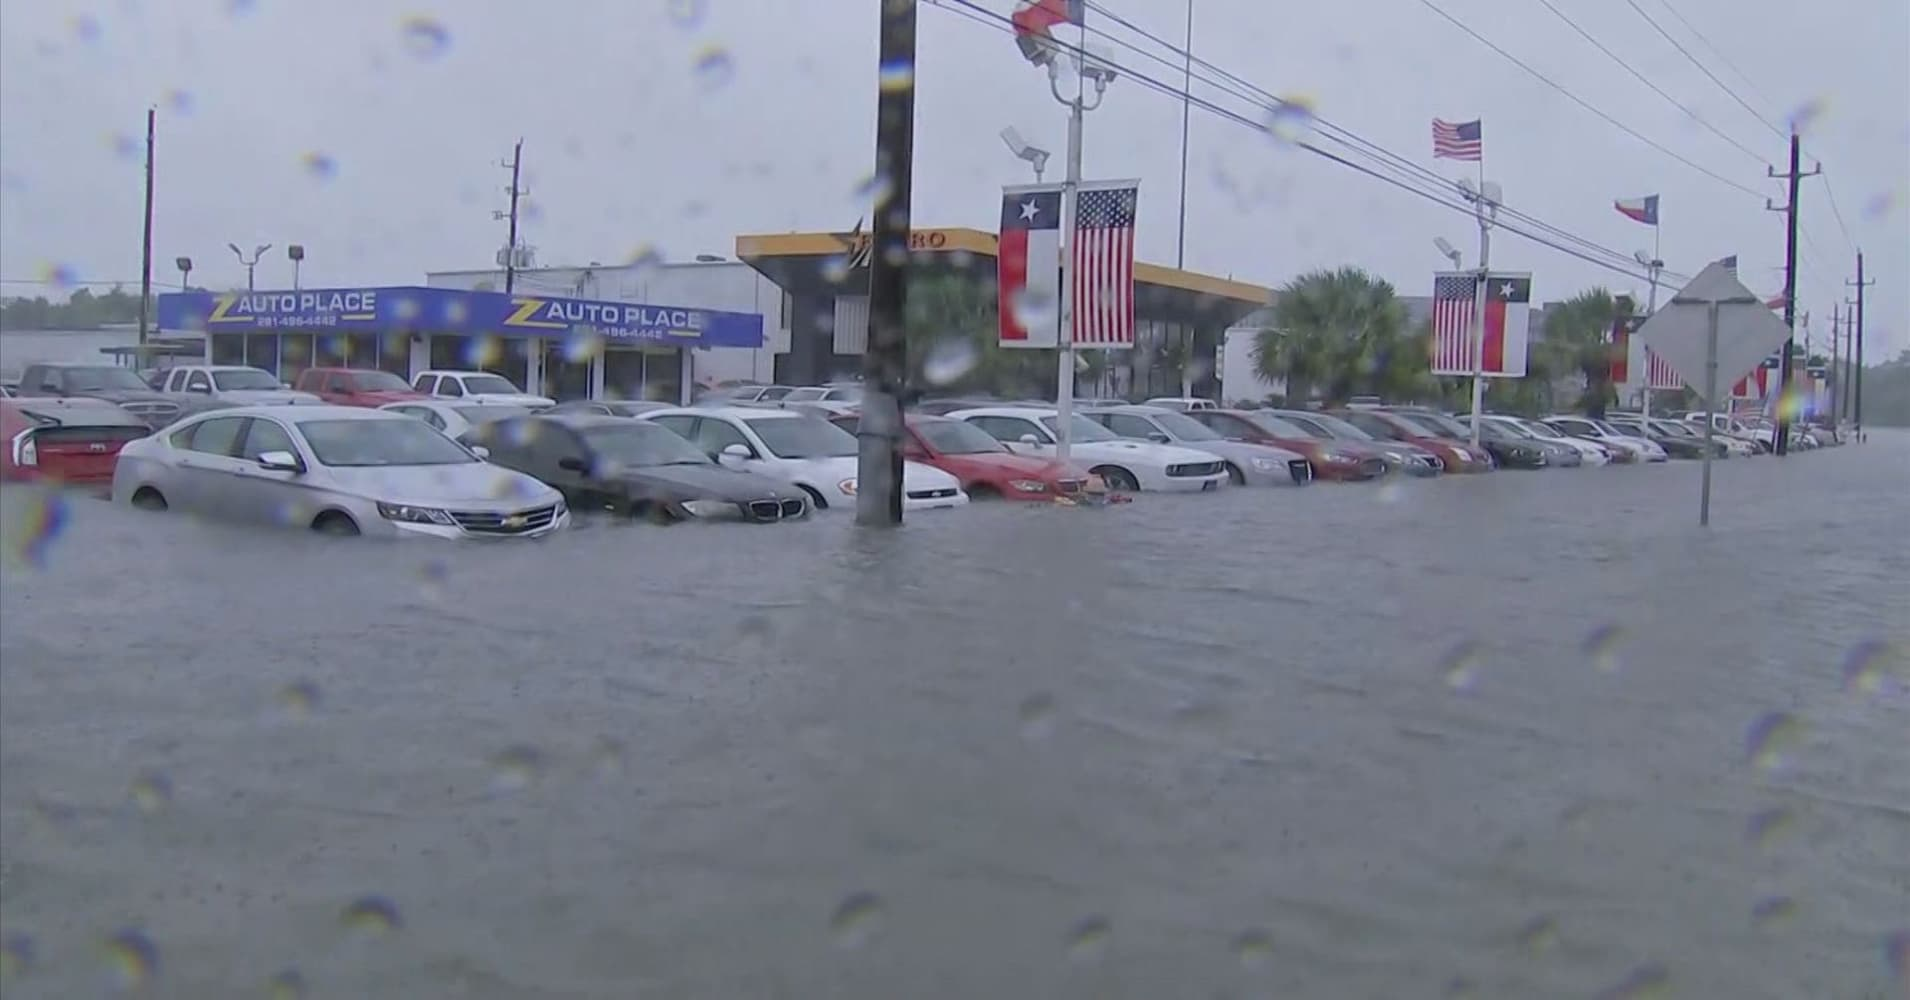 Used Car Dealerships In Dickinson Tx Car Dealerships In Houston Bad Credit Upcomingcarshq Com